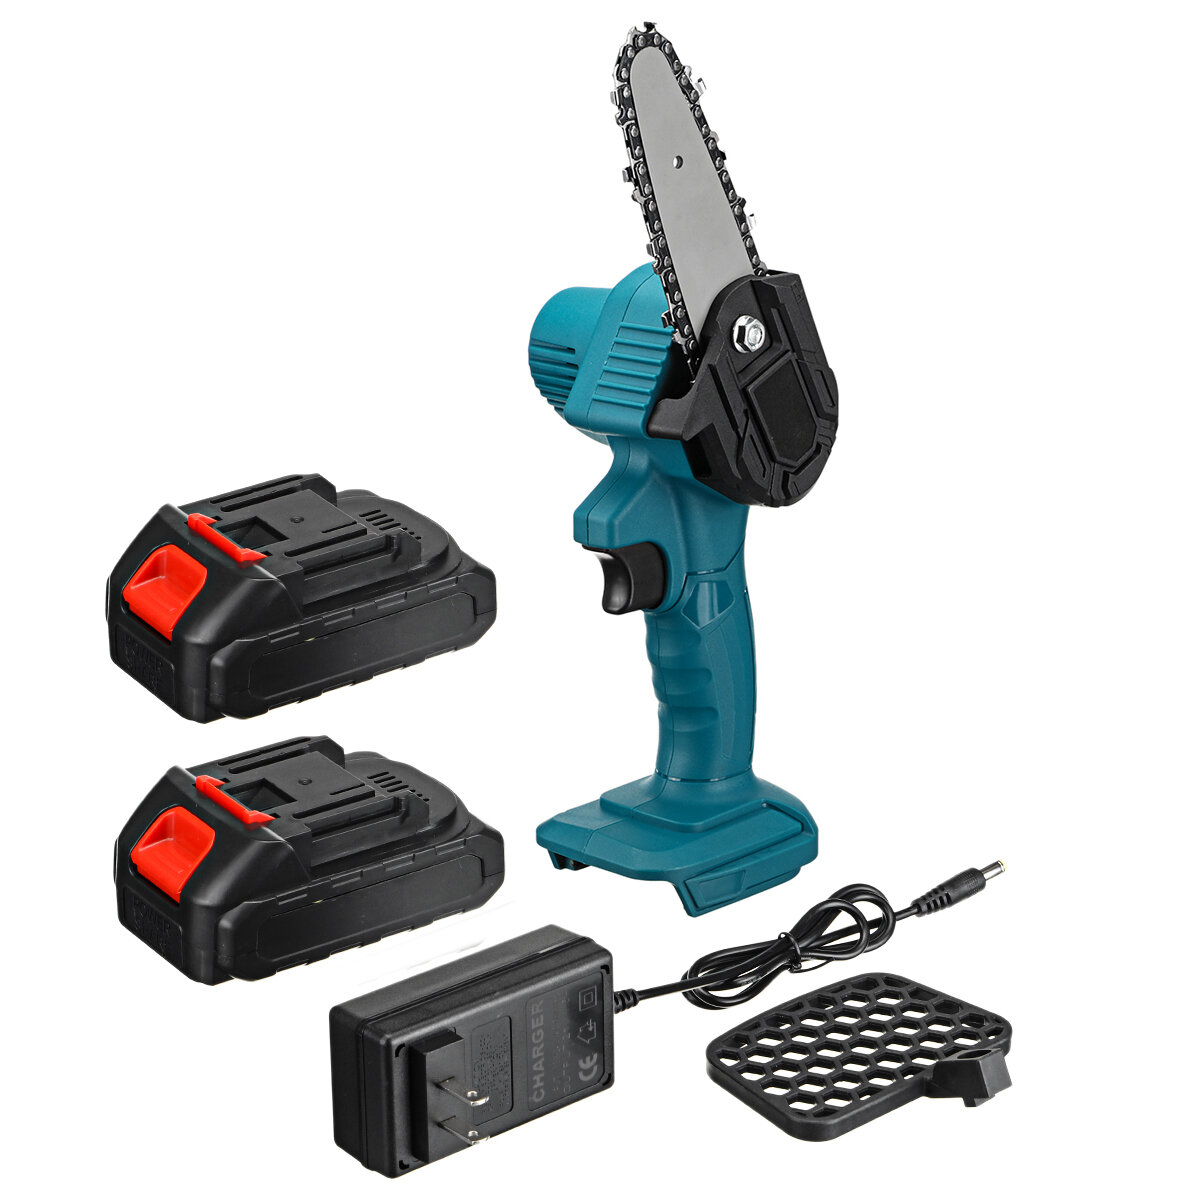 550W 48VF 4'' Mini Cordless One-Hand Electric Chain Saw Woodworking Wood Cutter W/ 2pcs Battery - EU Plug